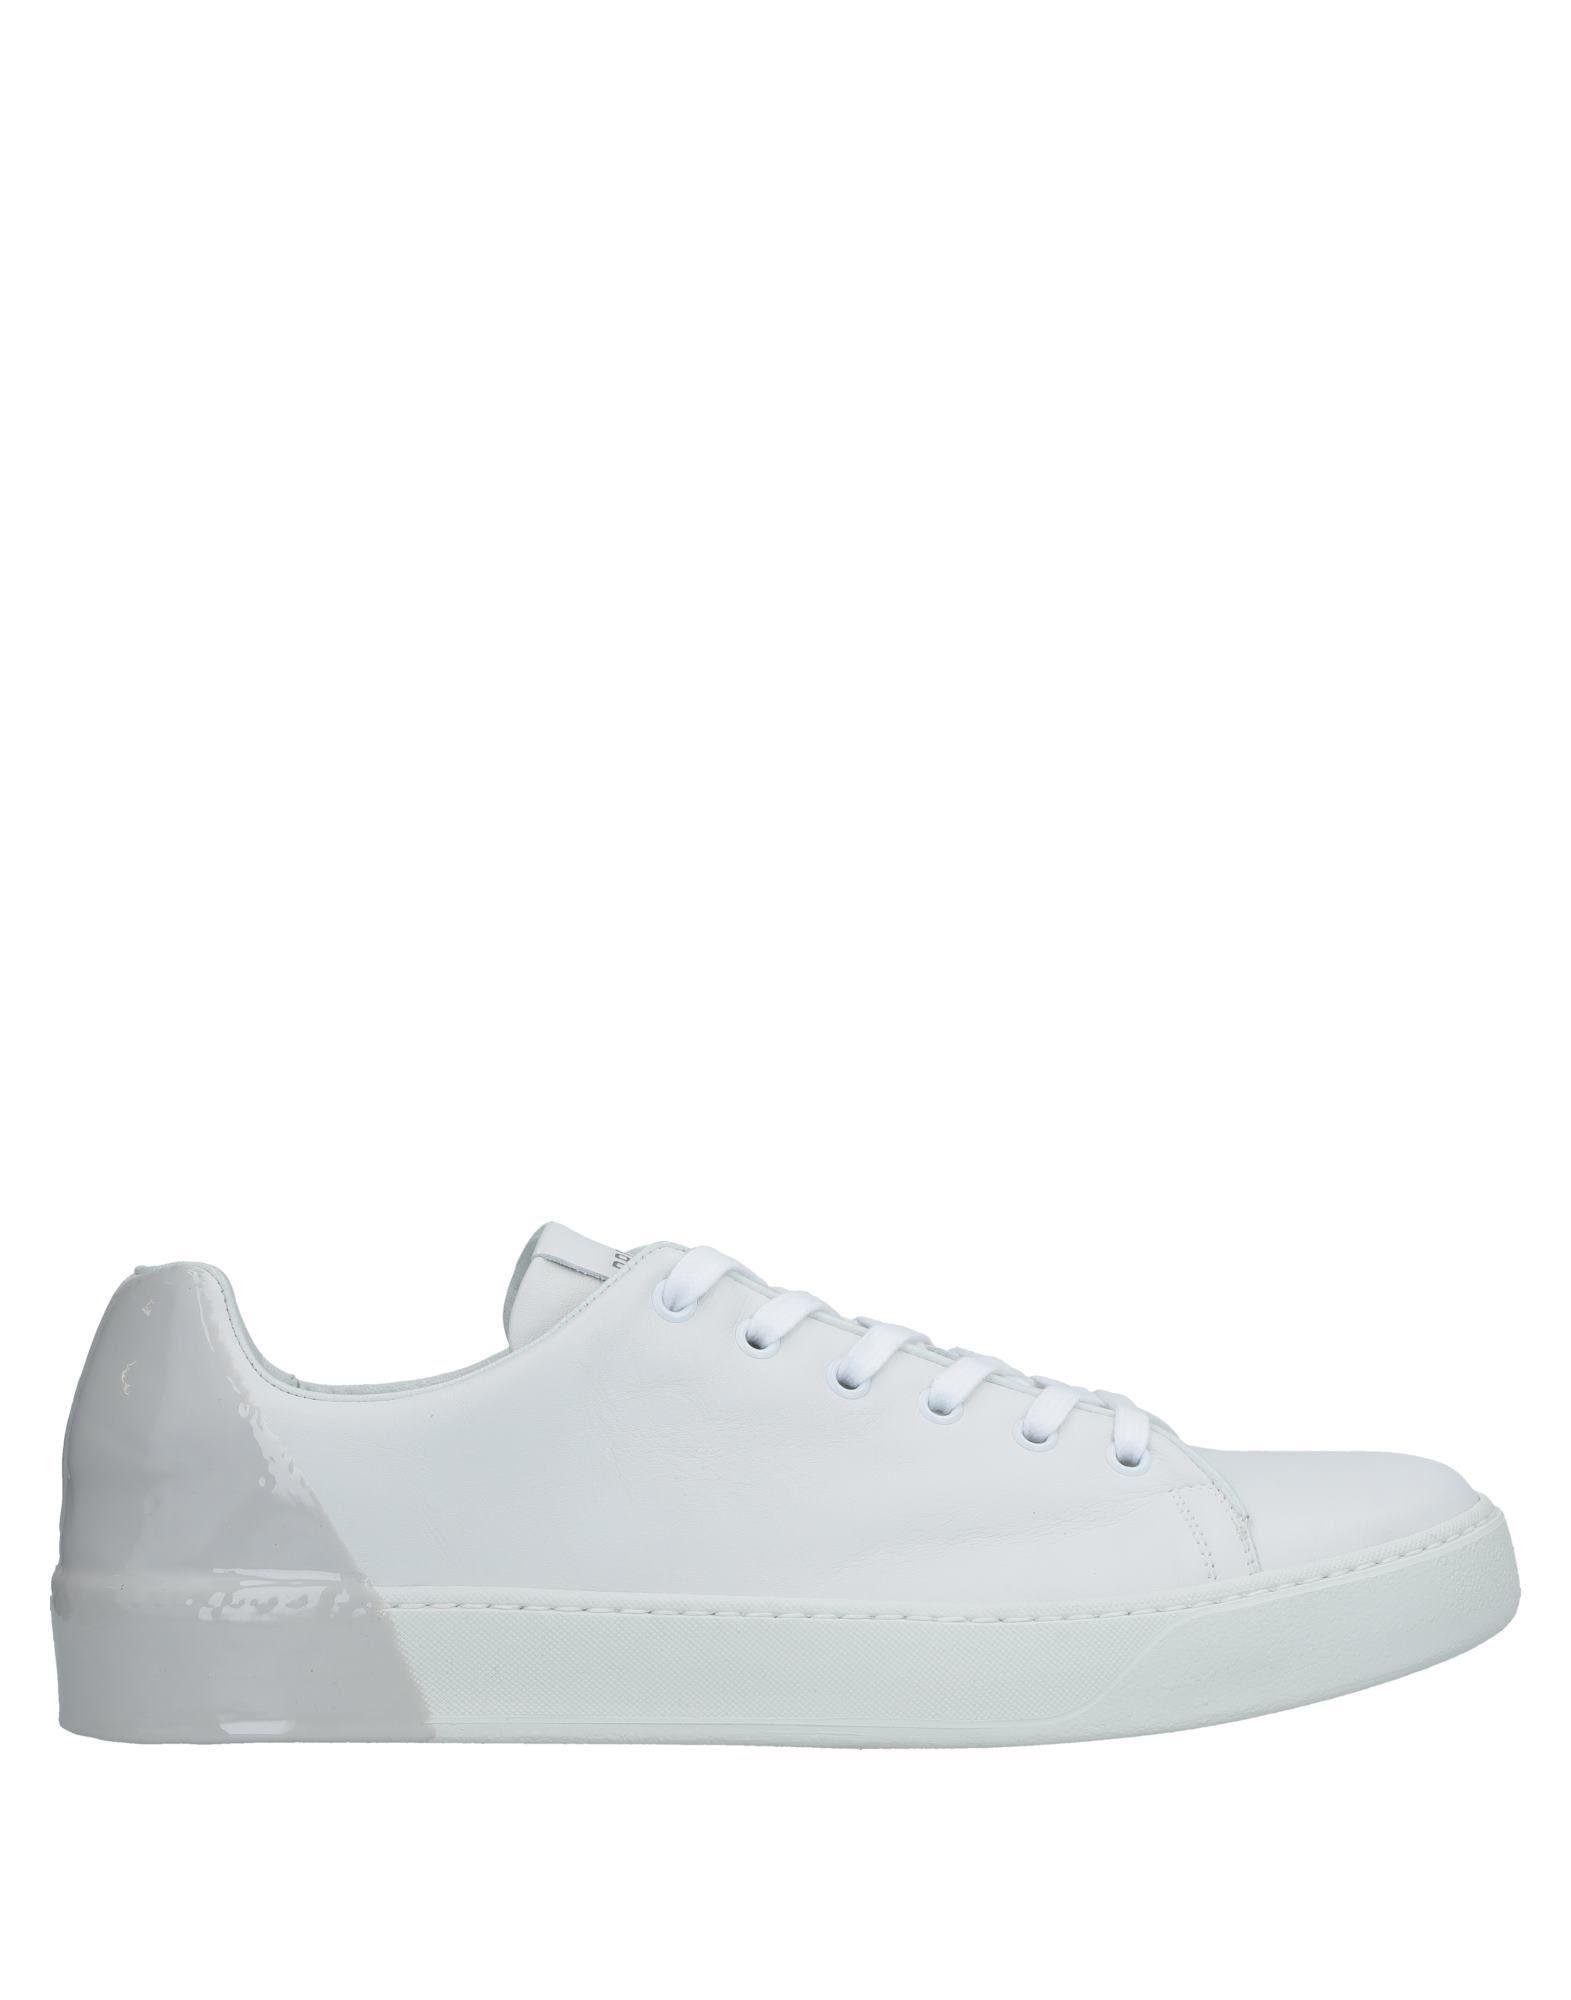 Premiata Sneakers Herren  11535878UP Gute Qualität beliebte Schuhe